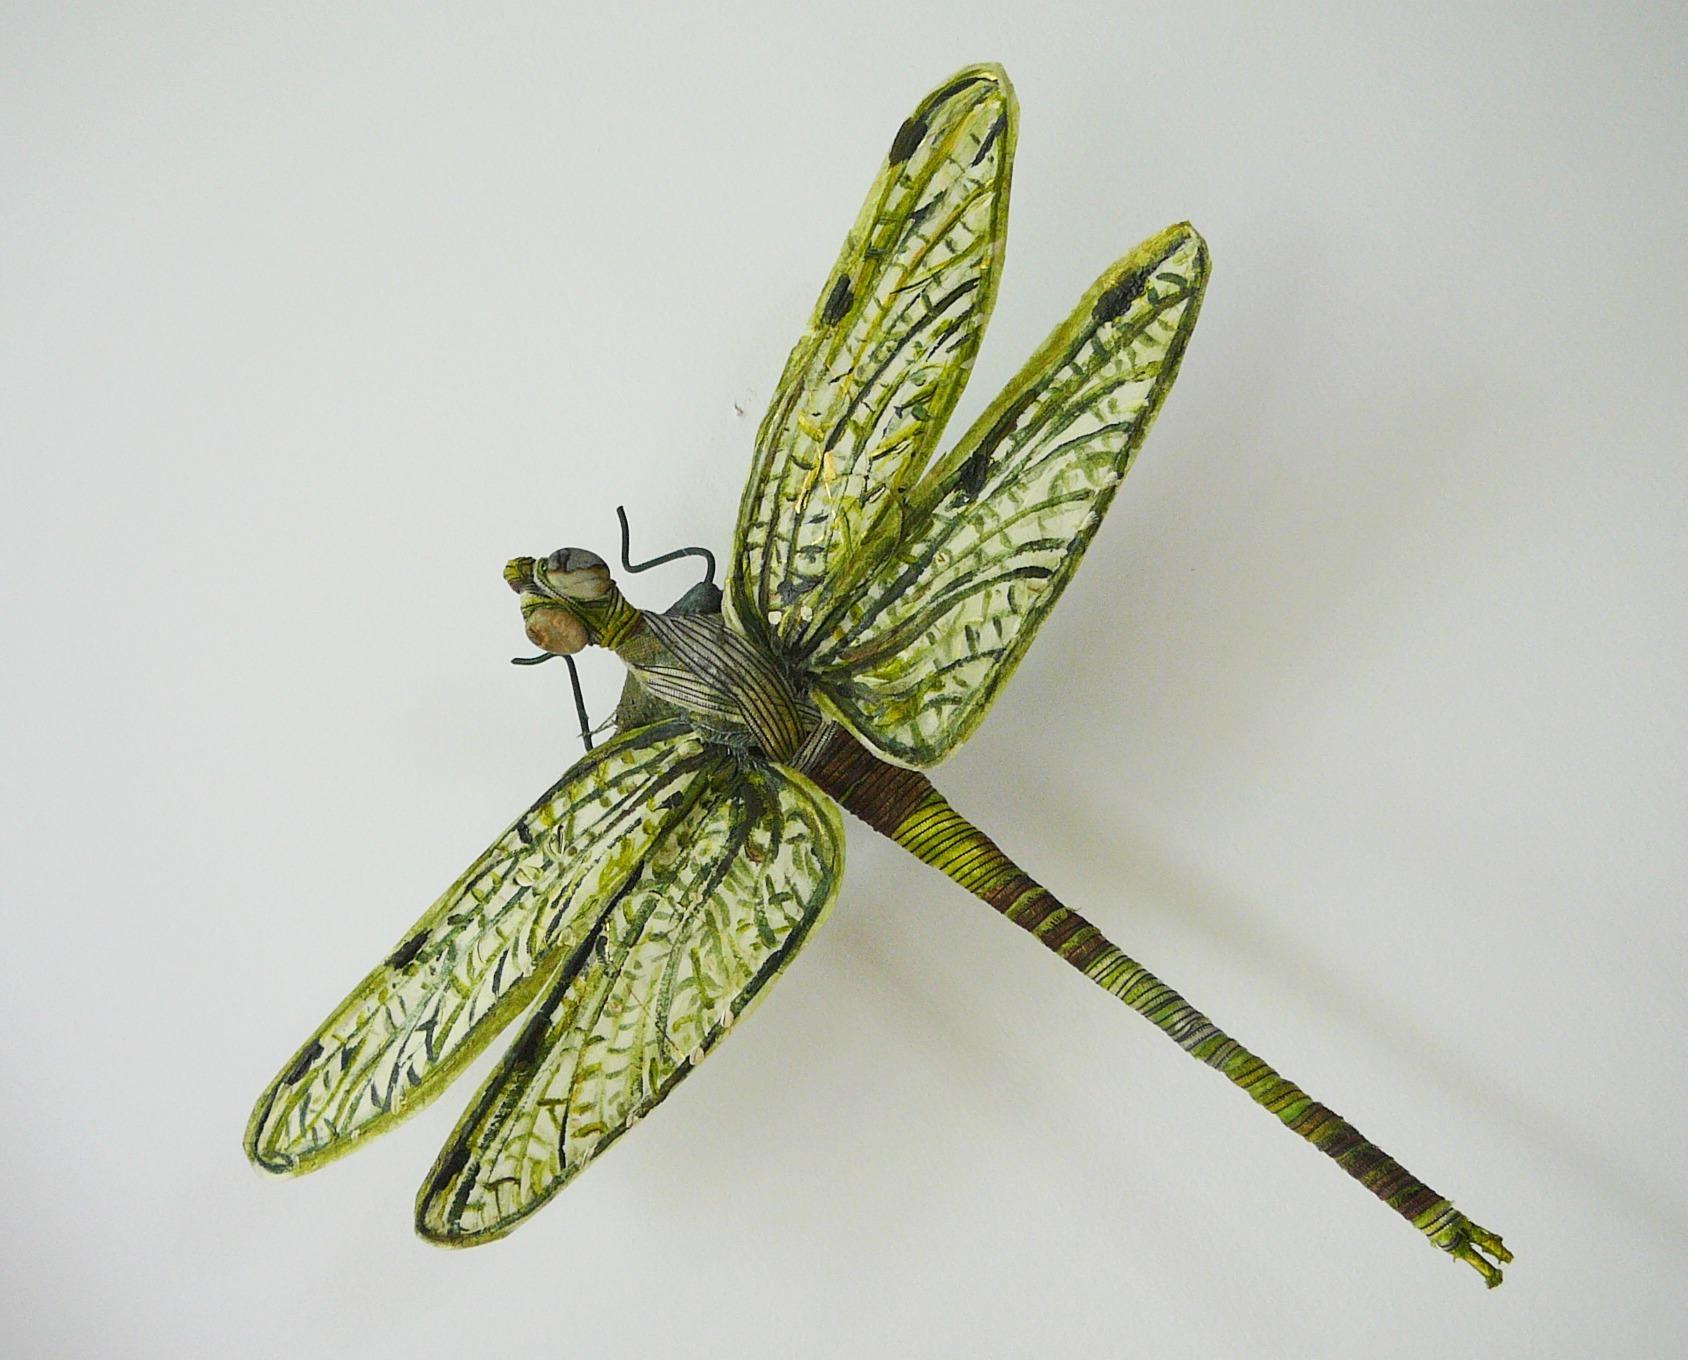 A essay on dragonfly